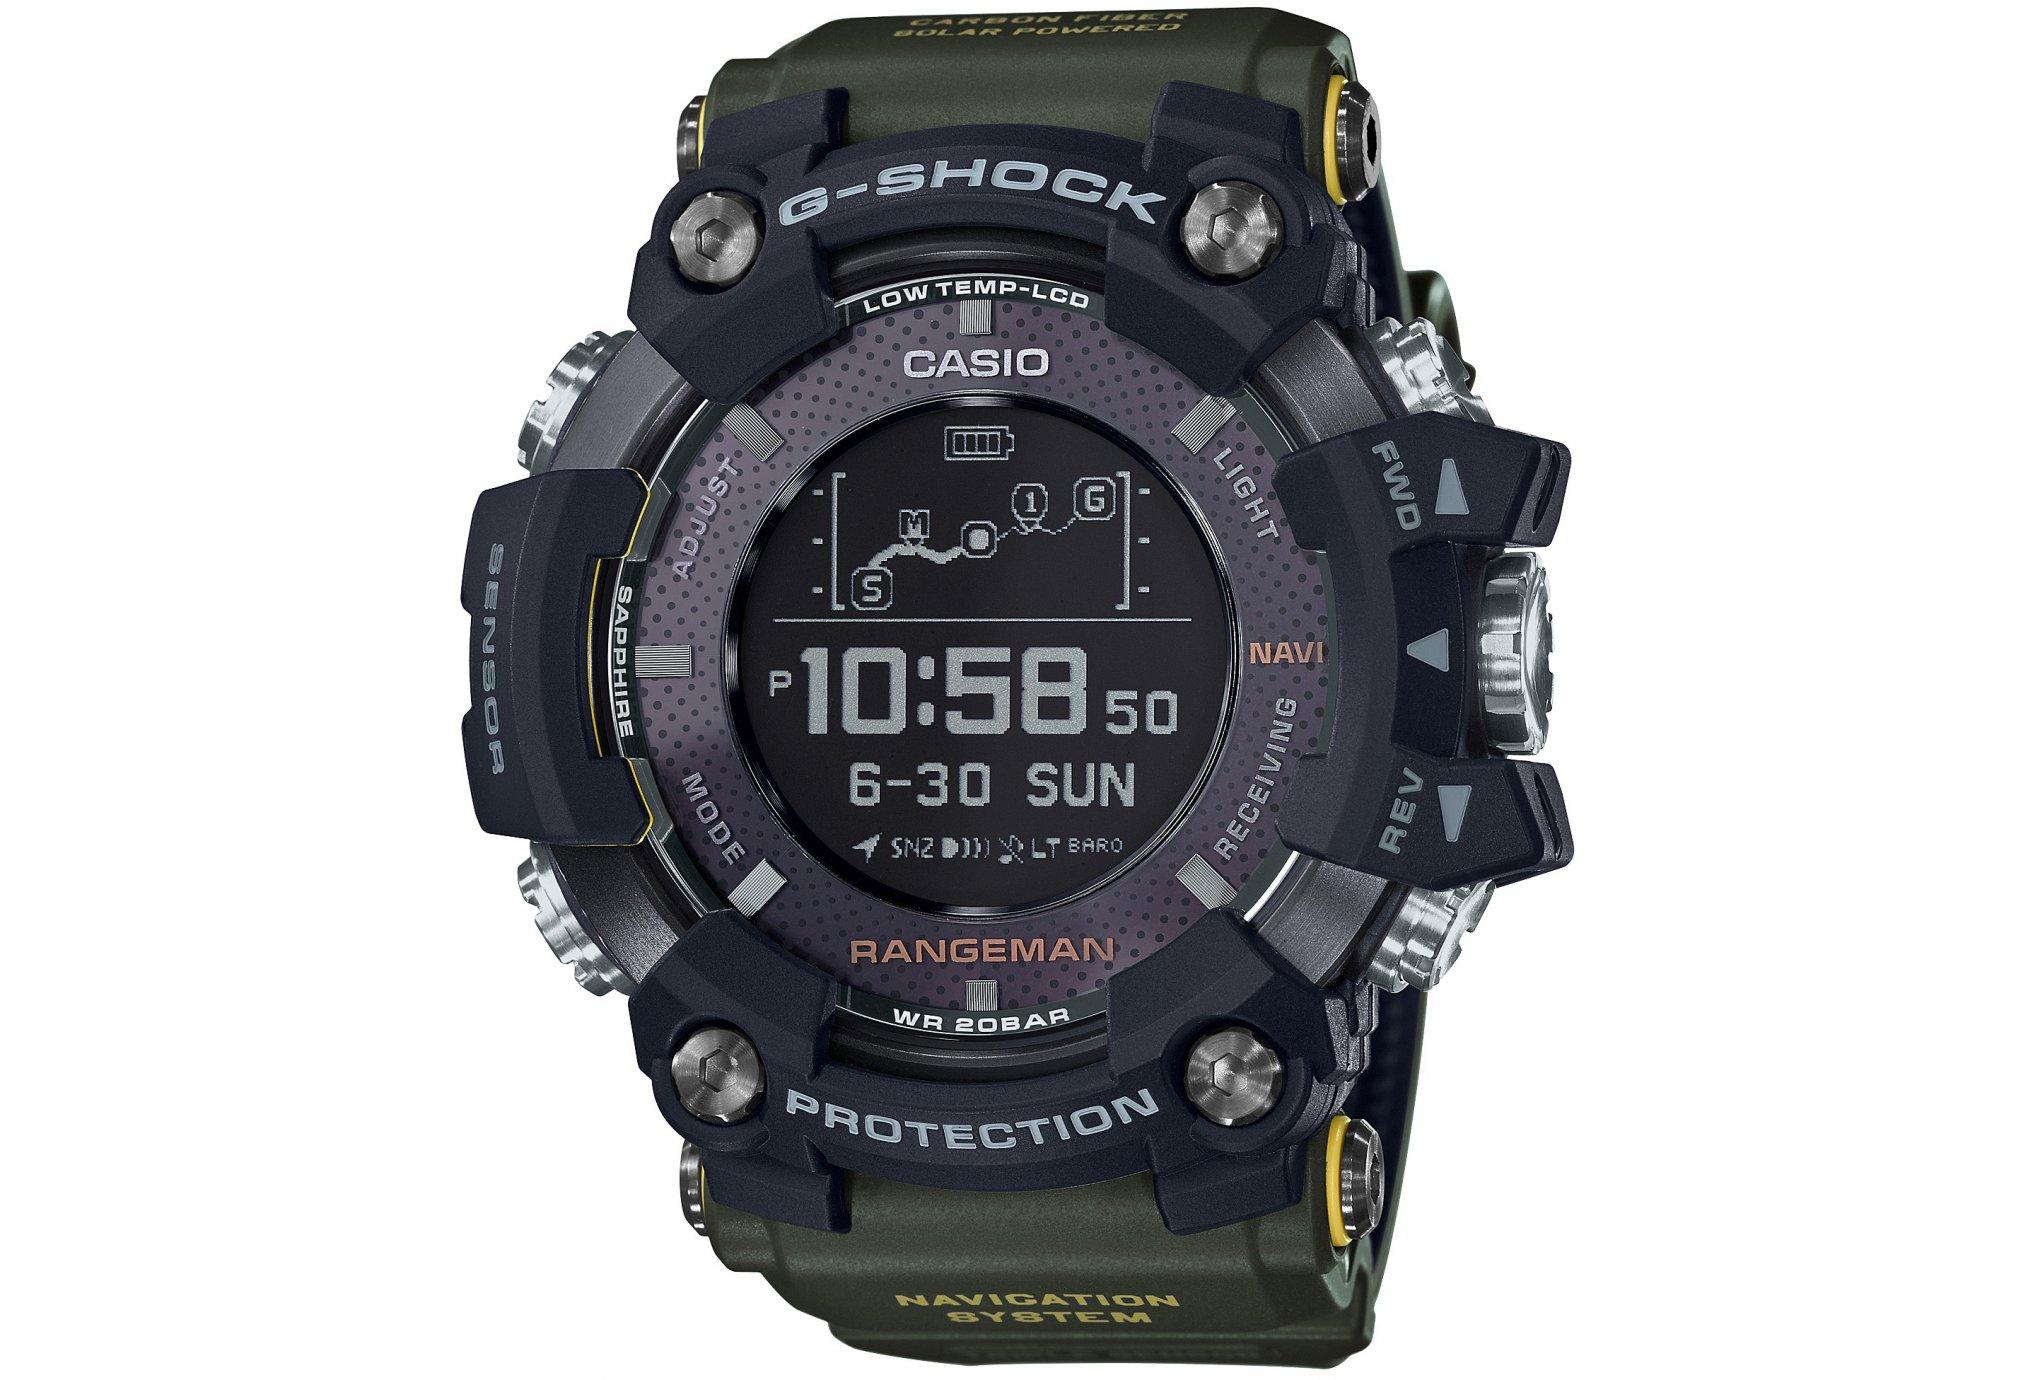 Casio G-Shock rangeman gpr-b1000 cardio-gps